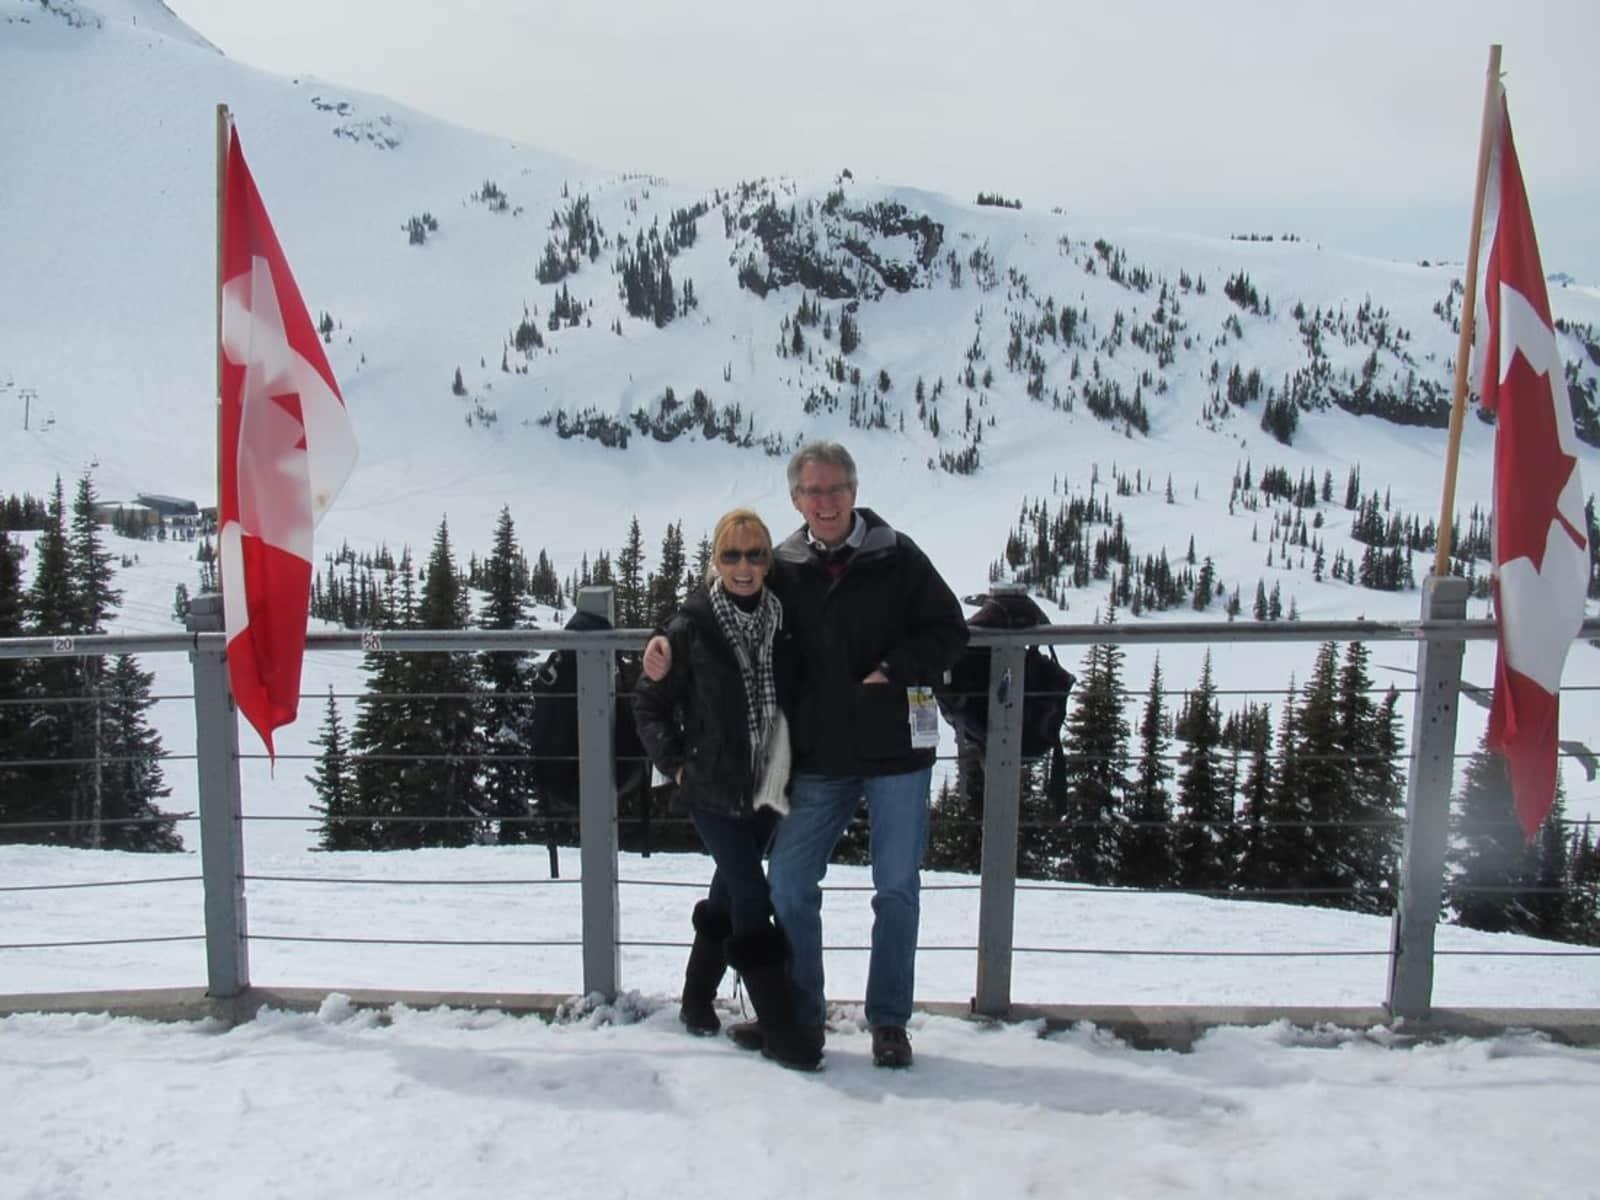 Angela & John from London, United Kingdom